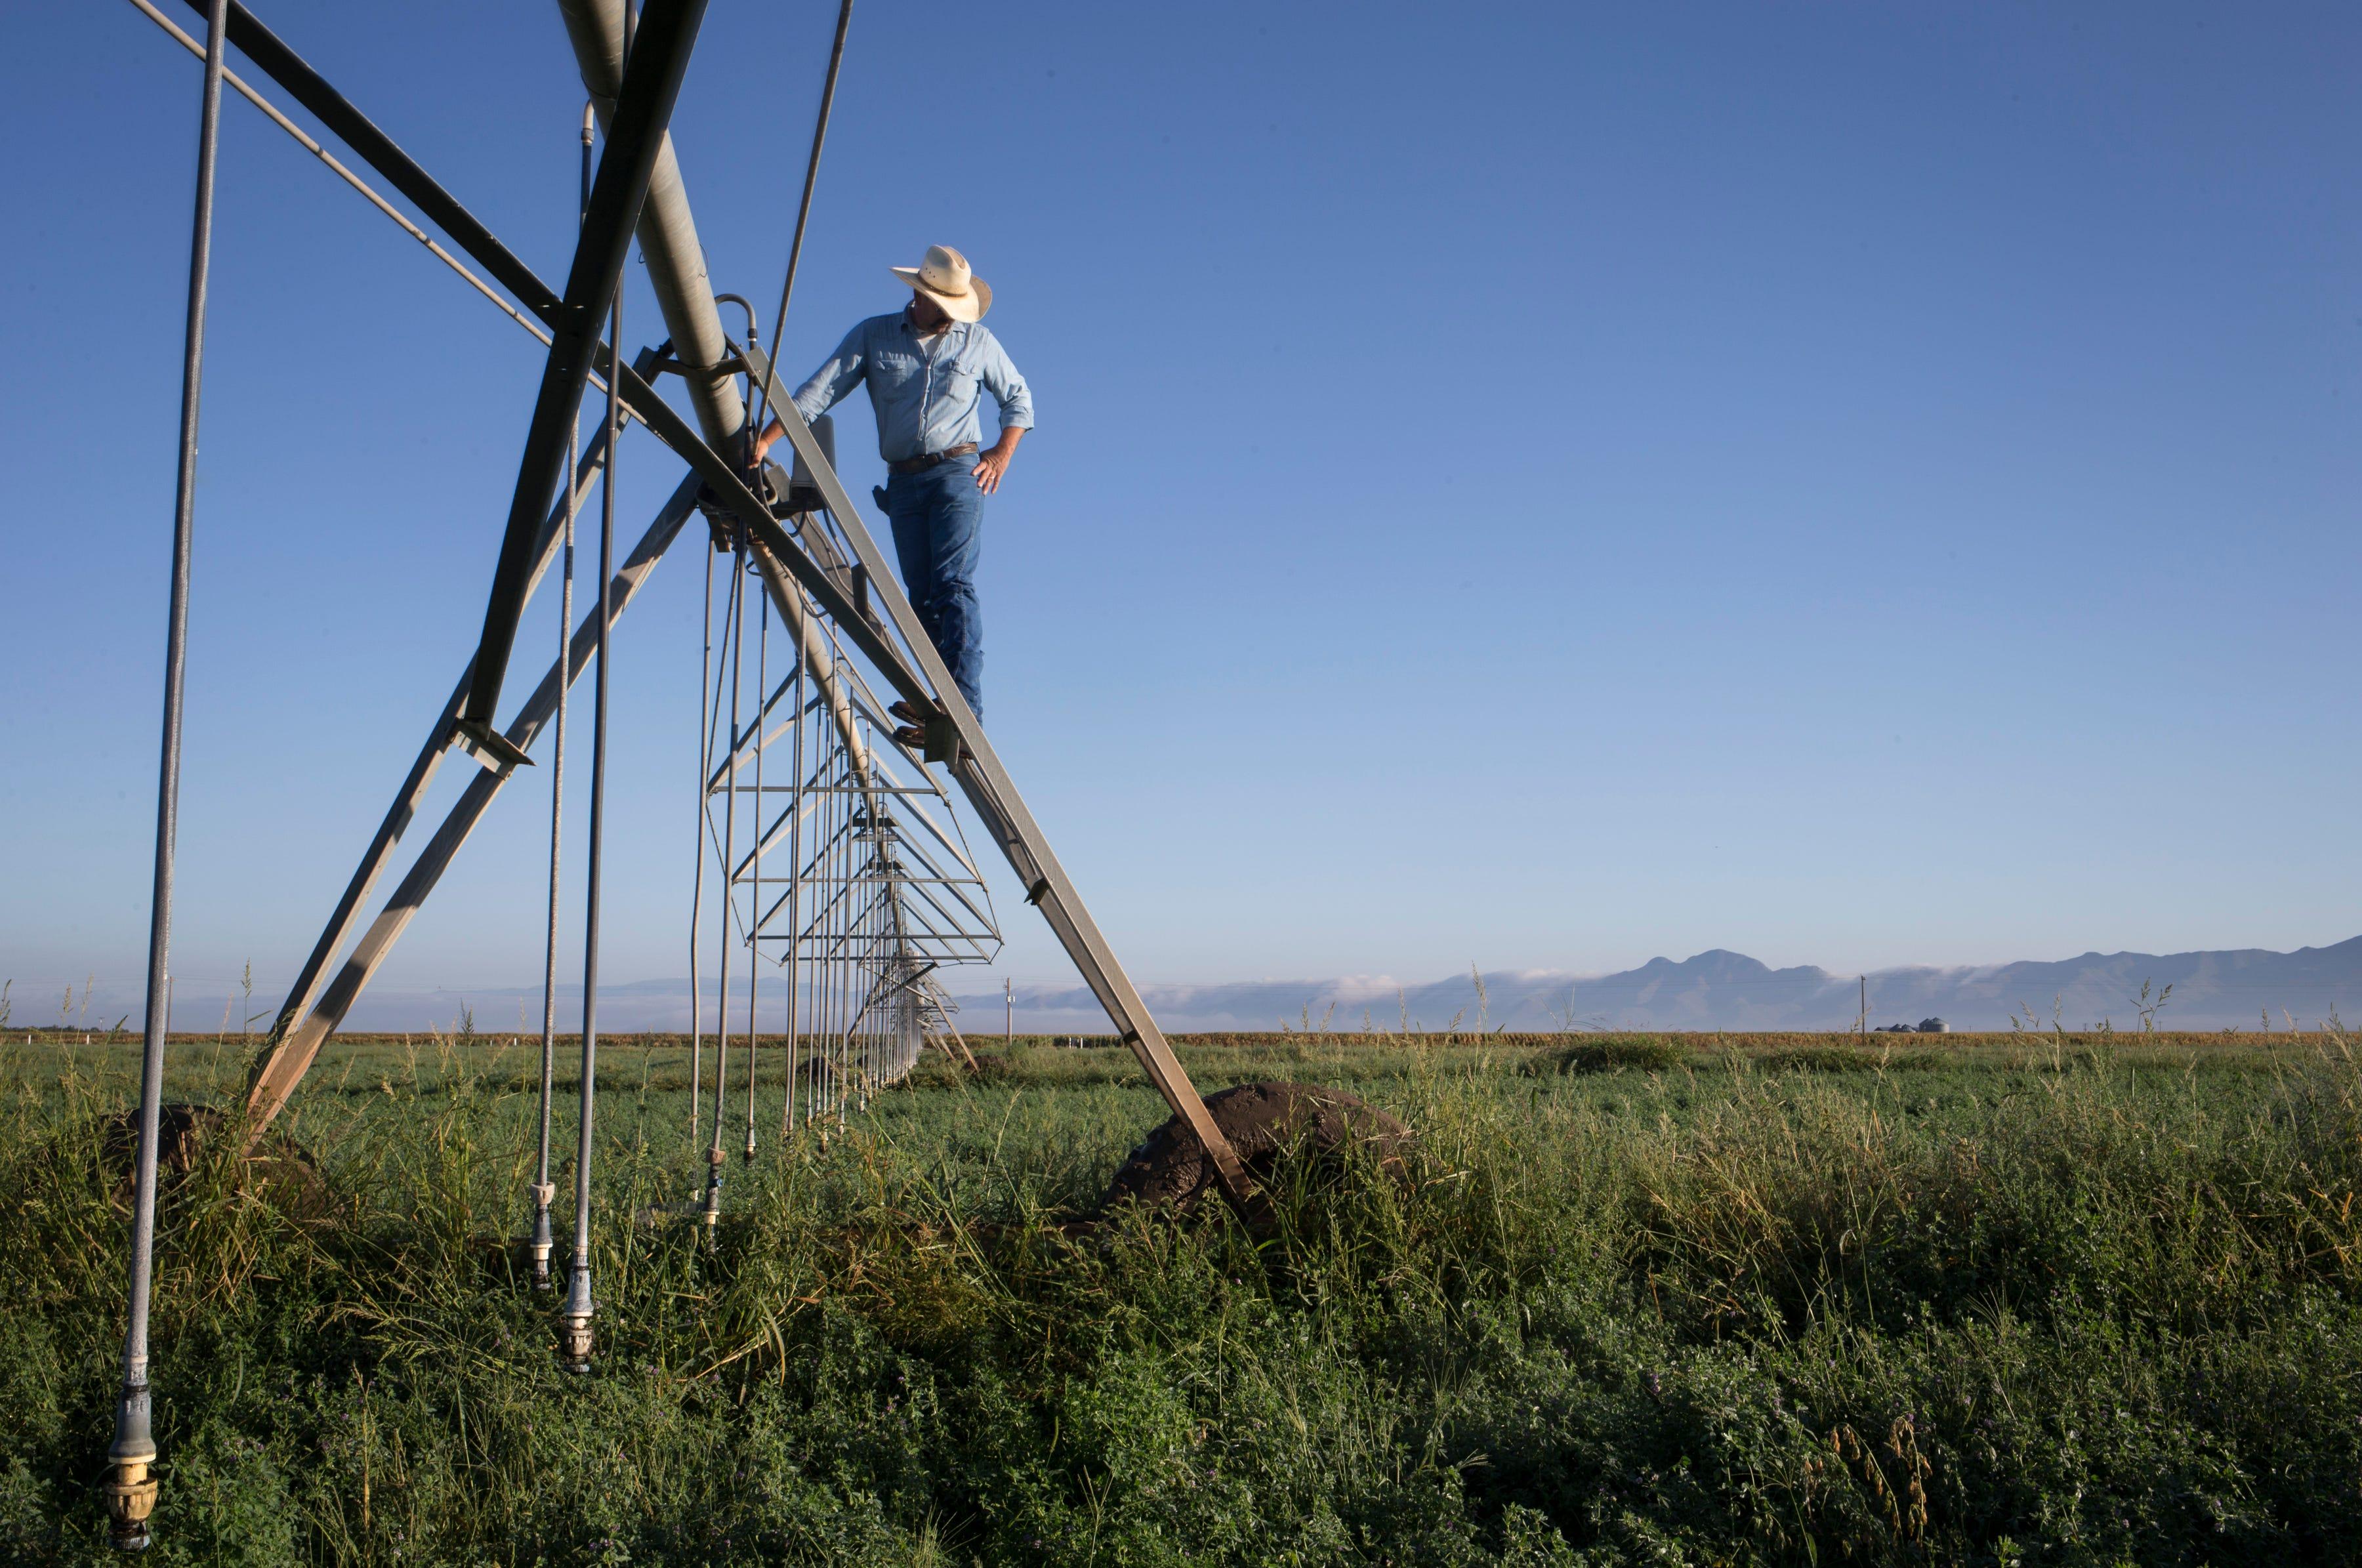 John Hart checks the control box on center-pivot that was stuck in an alfalfa field, Sept. 16, 2019, at Wagon Wheel Farms, Kansas Settlement, Arizona.